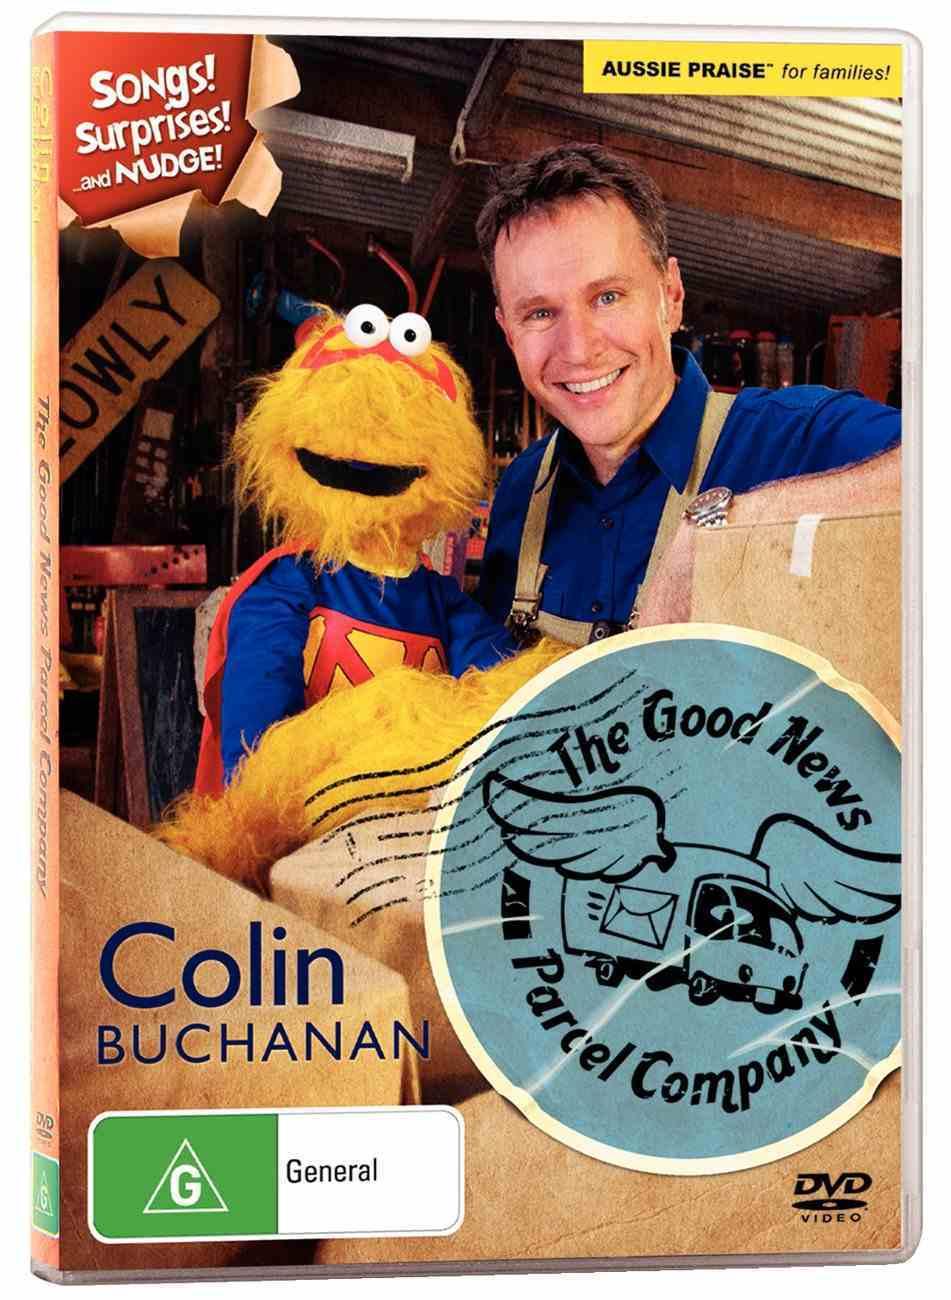 The Good News Parcel Company DVD